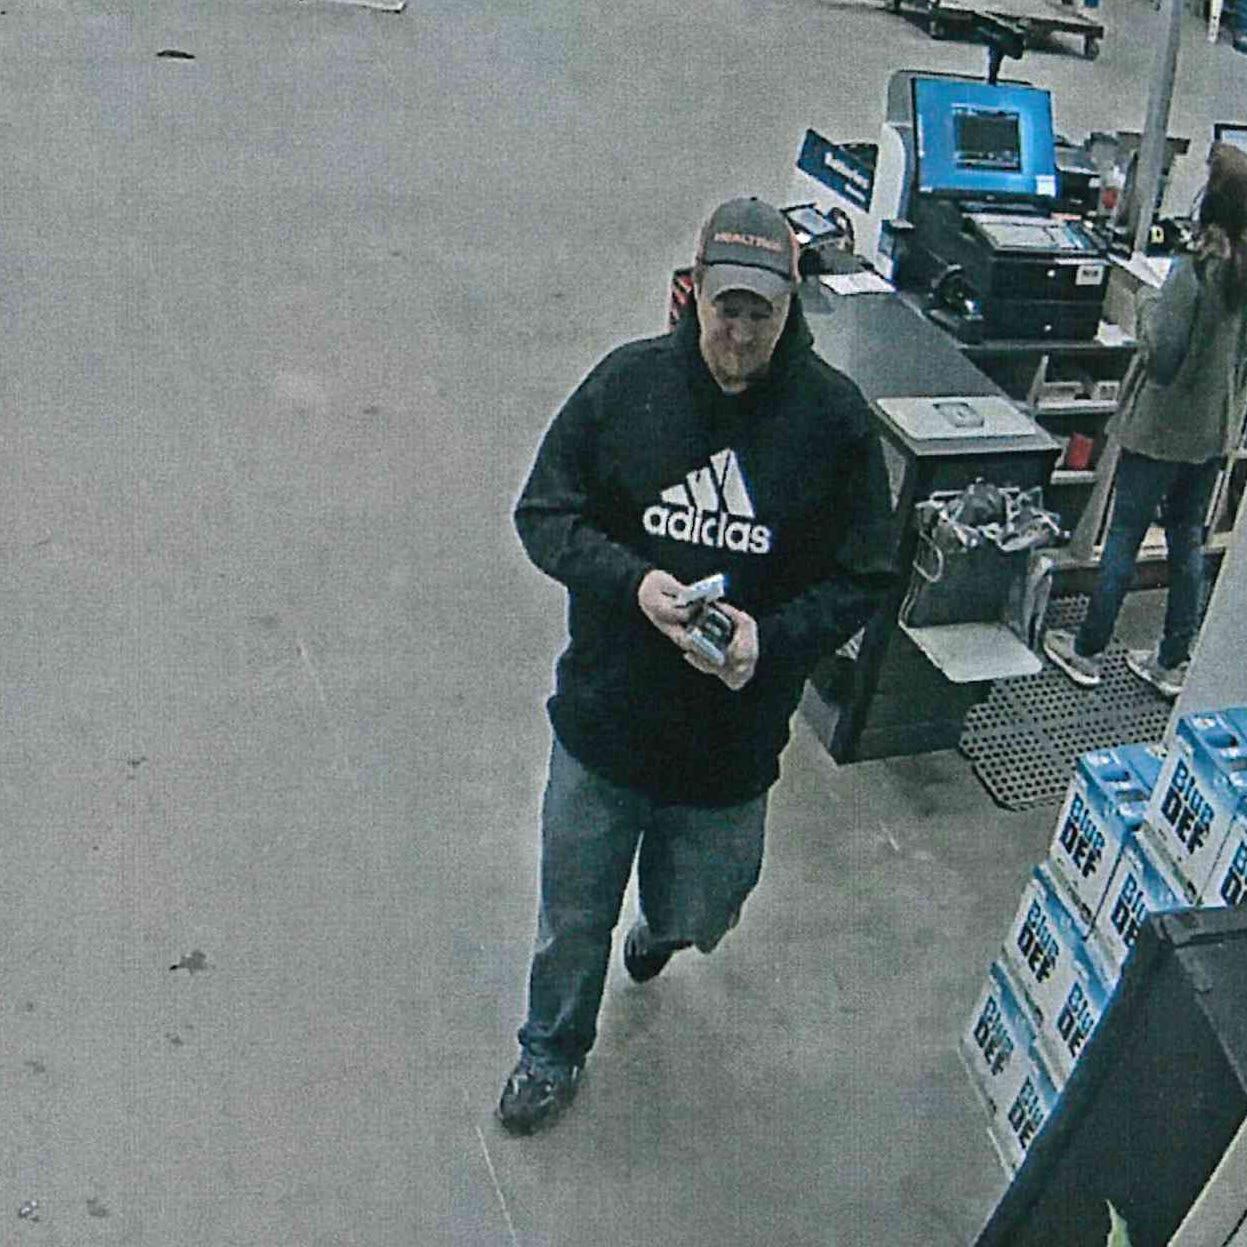 Muncie police seek help in identifying theft suspect